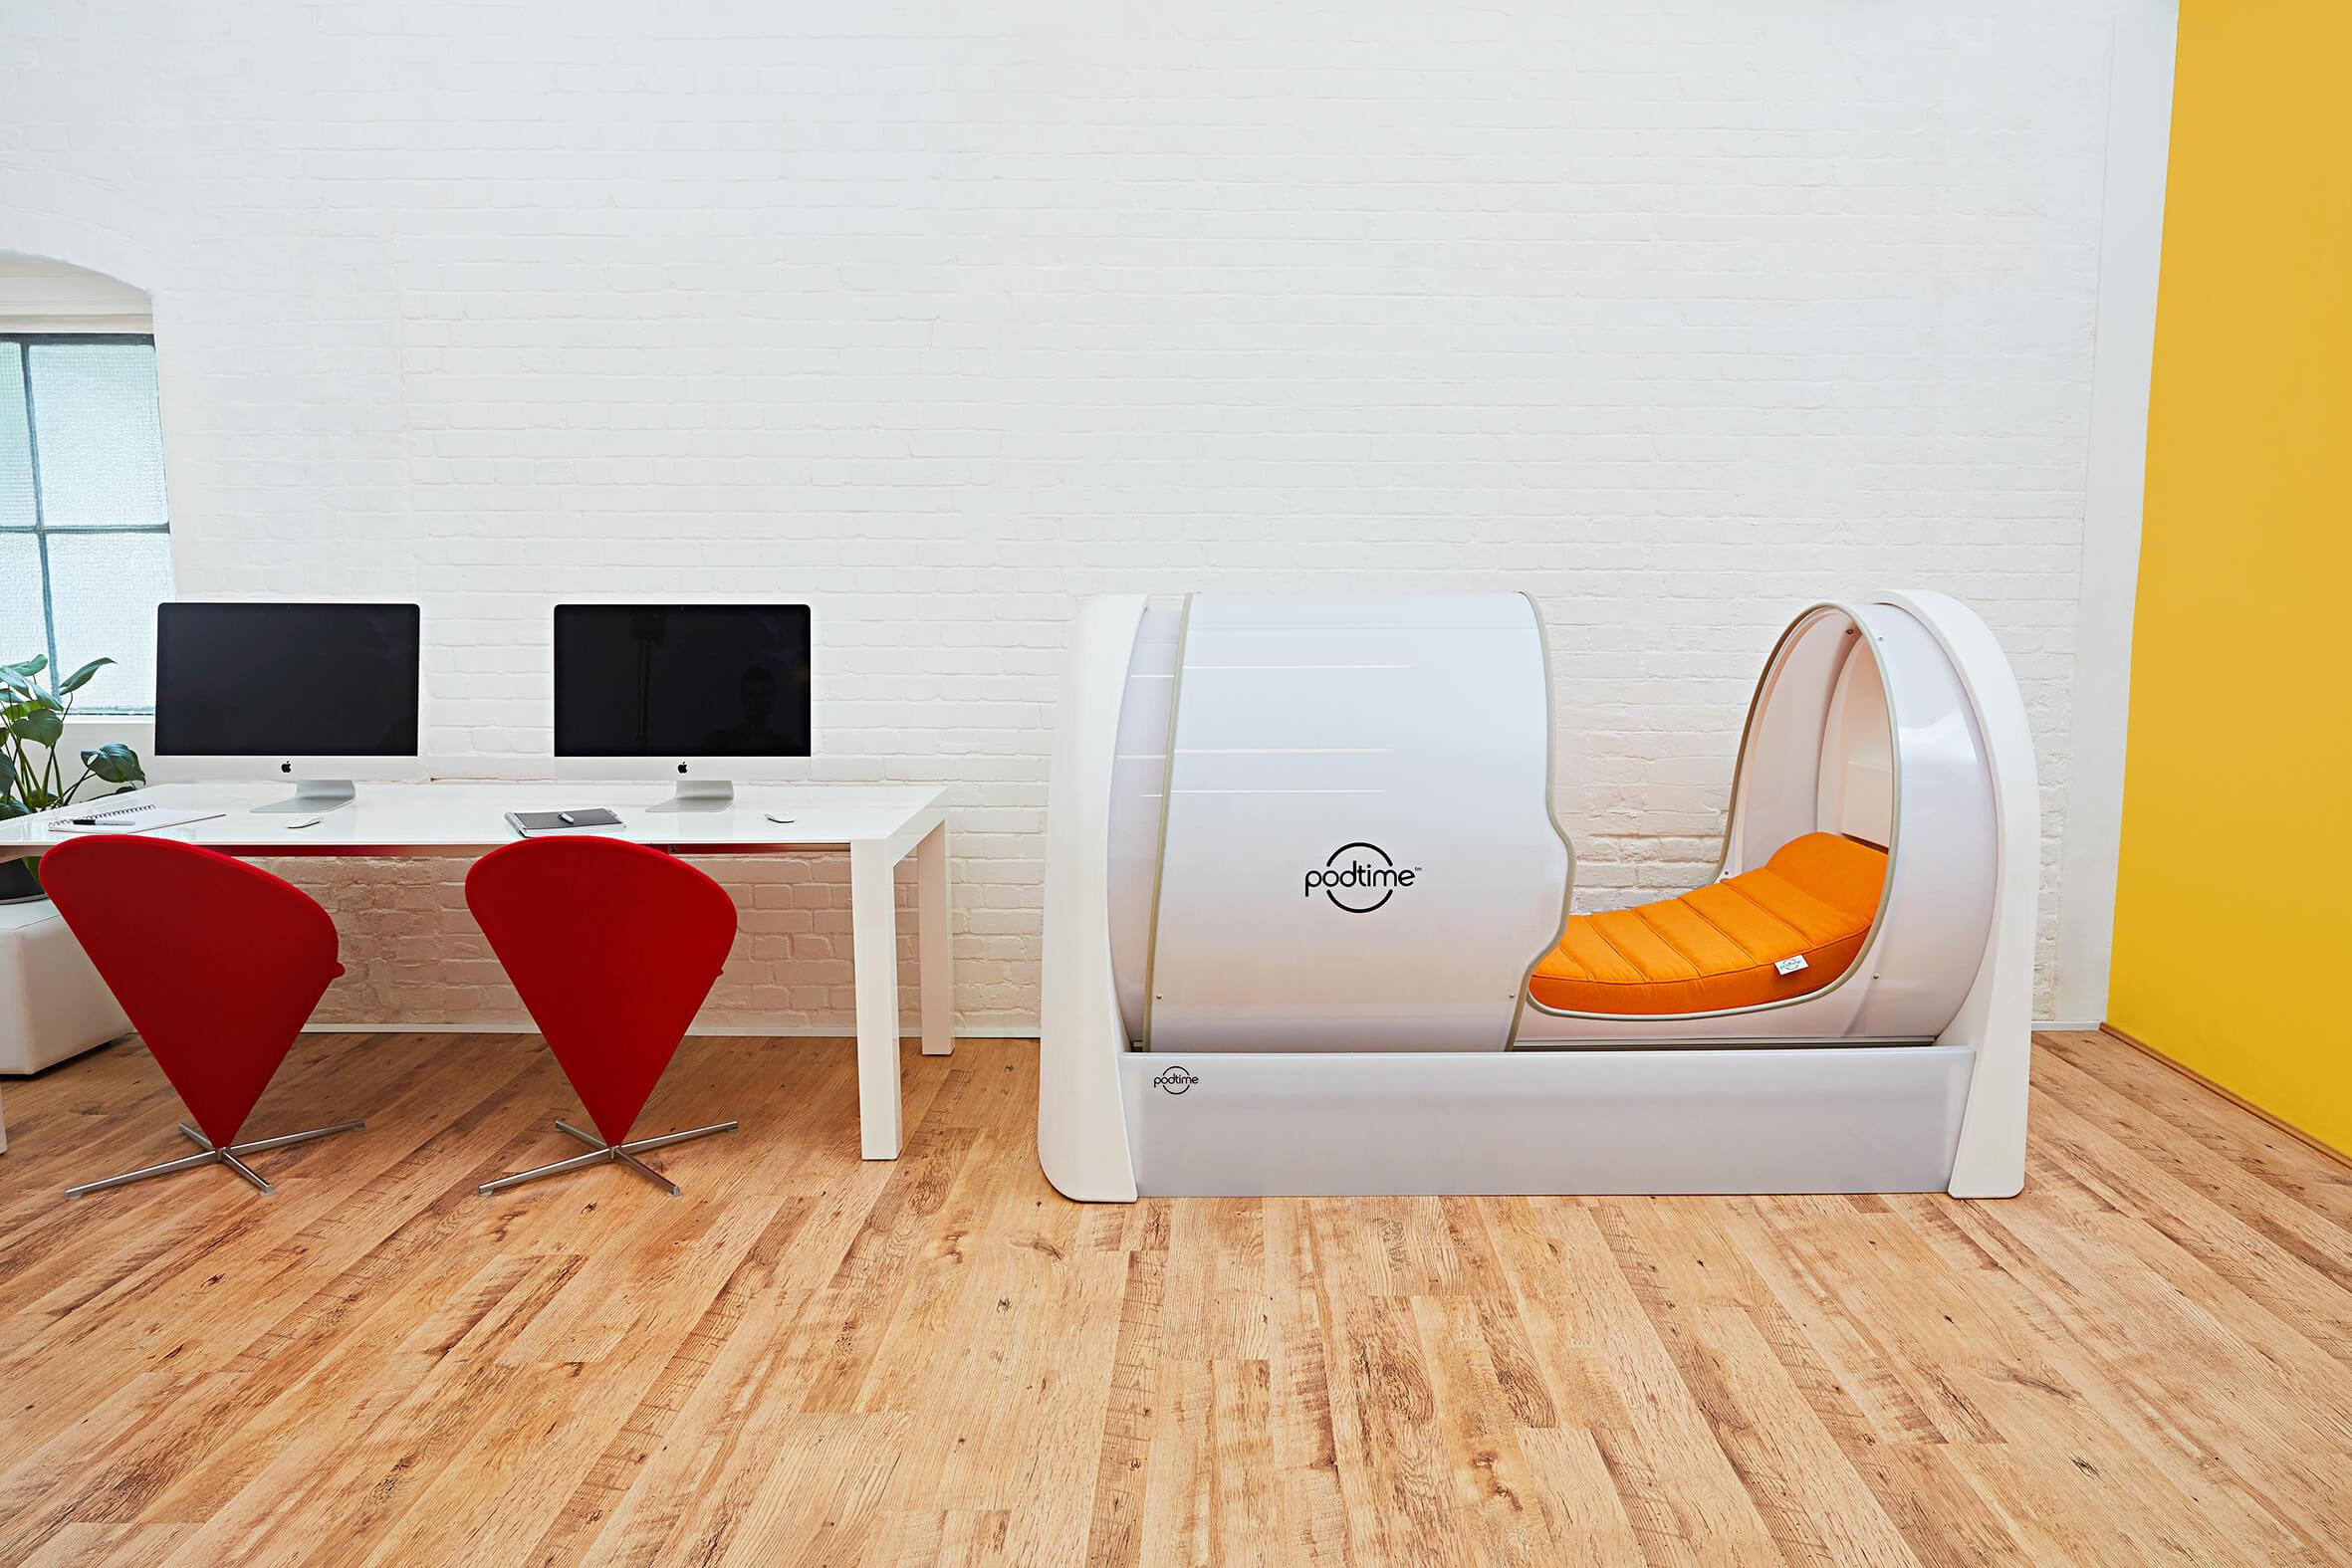 Podtime Premium Sleep Pod - Office Location